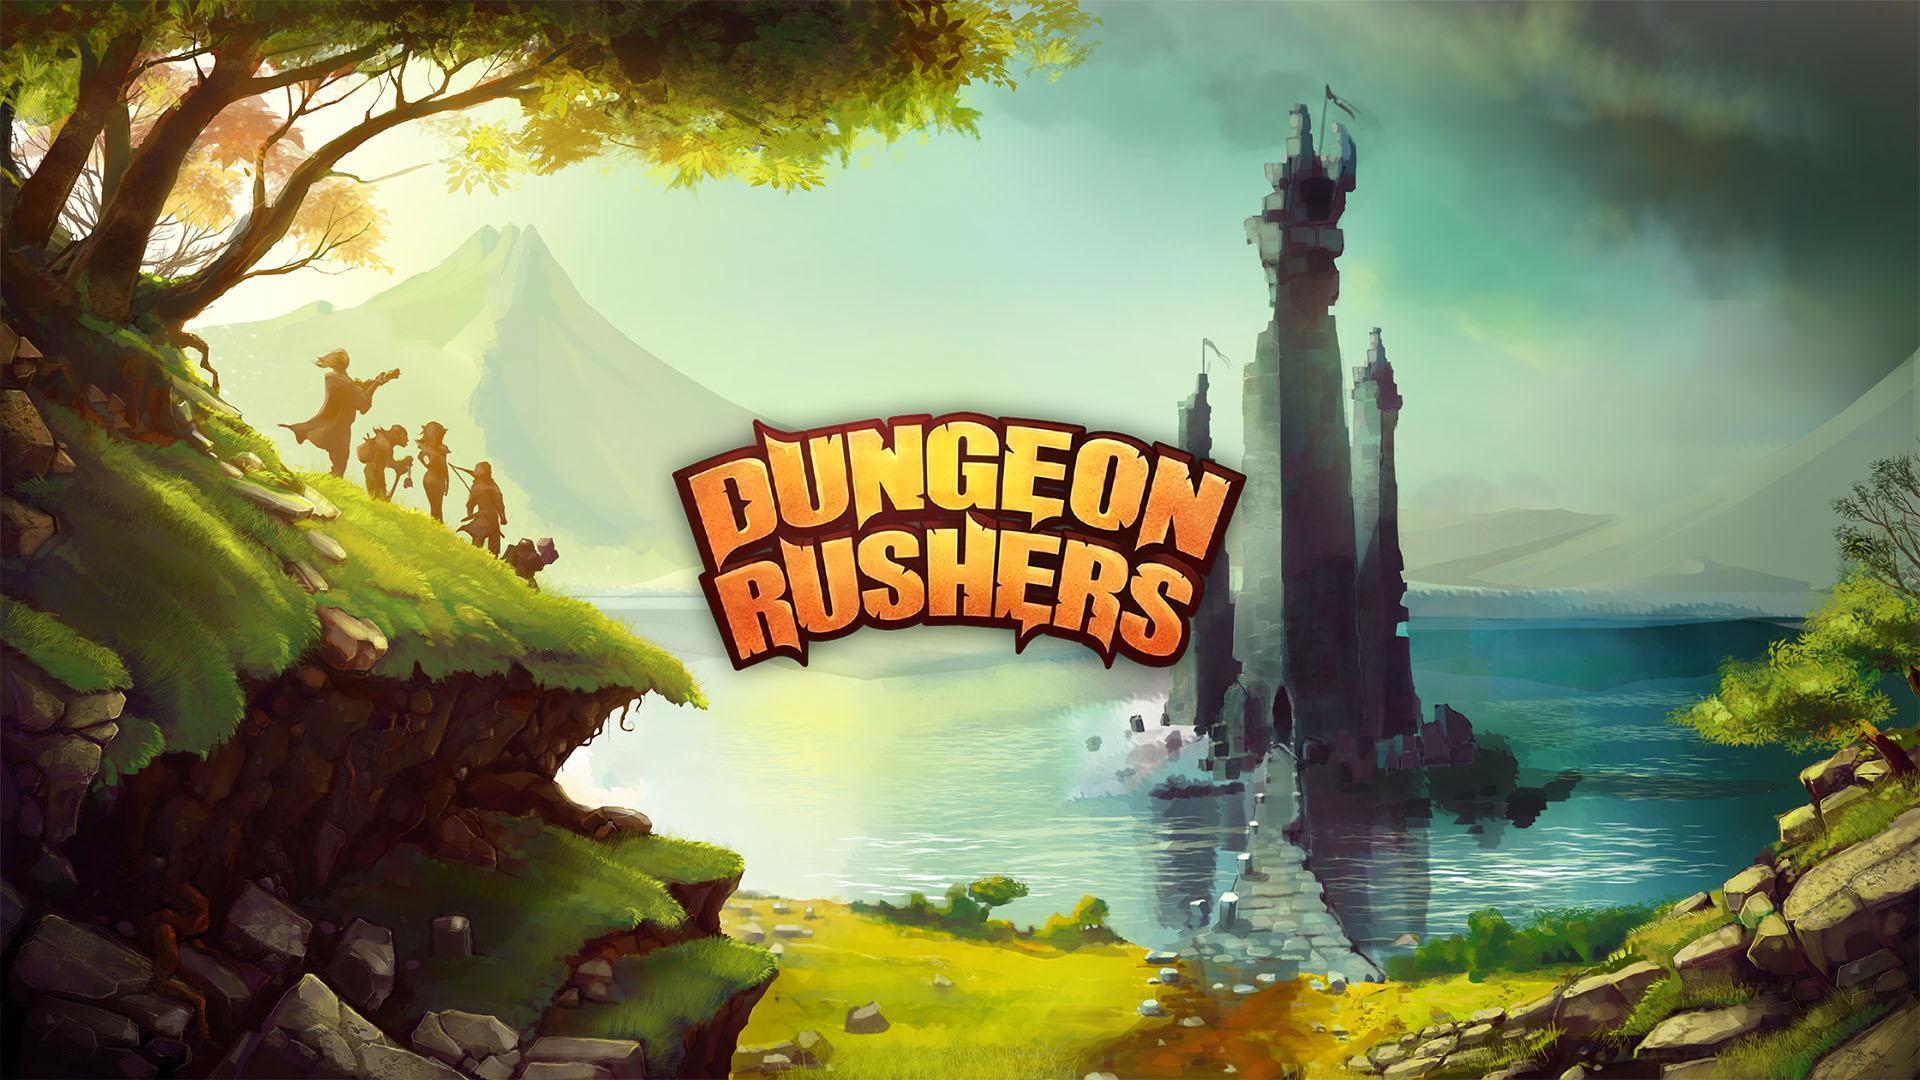 Dungeon Rushers (Nintendo Switch) Review